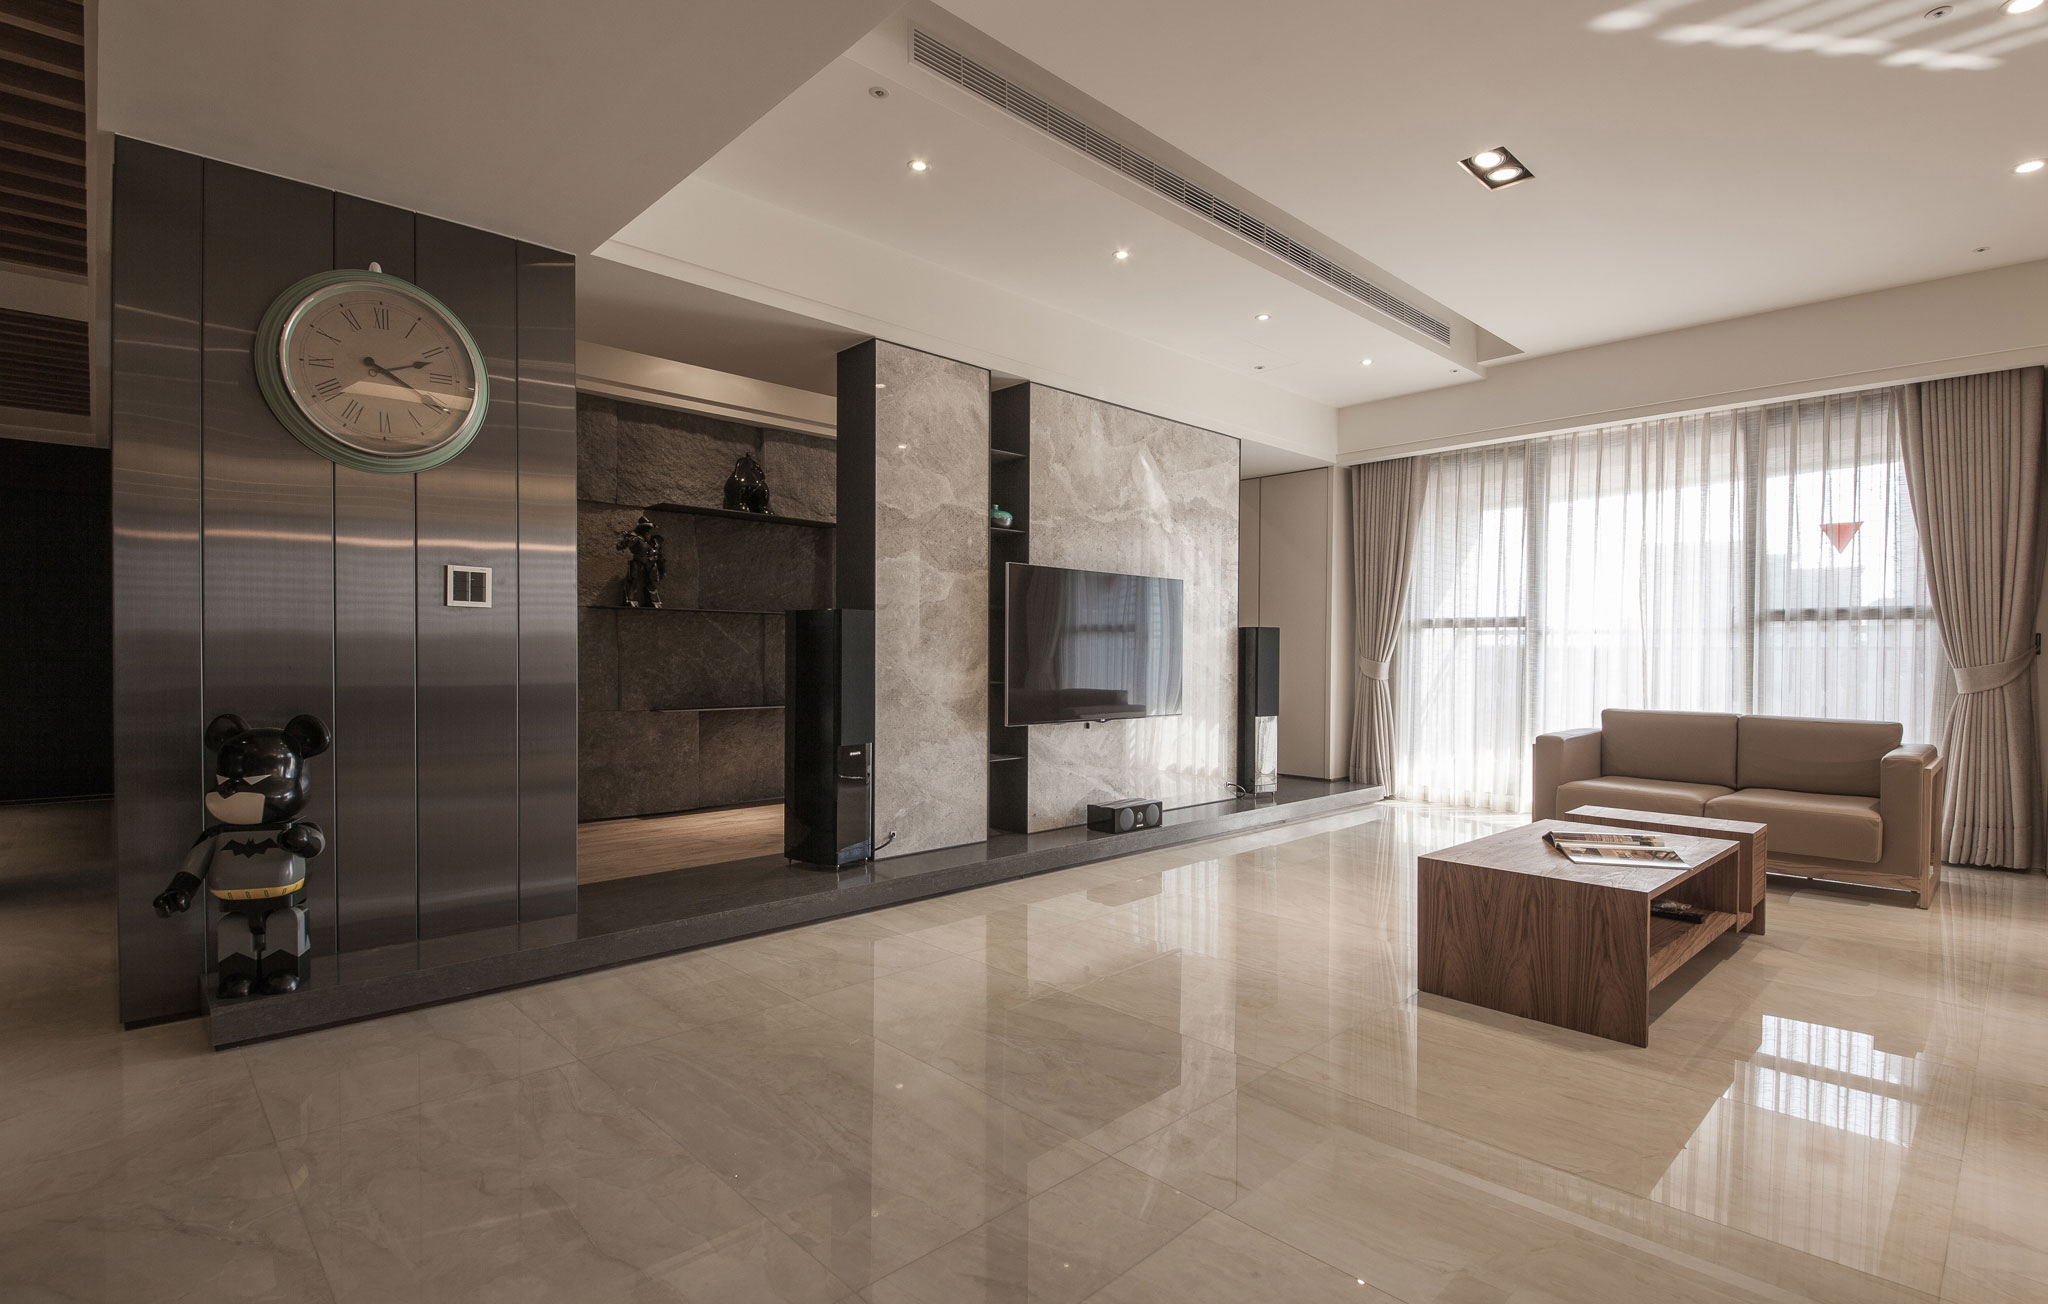 minimalist interior design on a budget